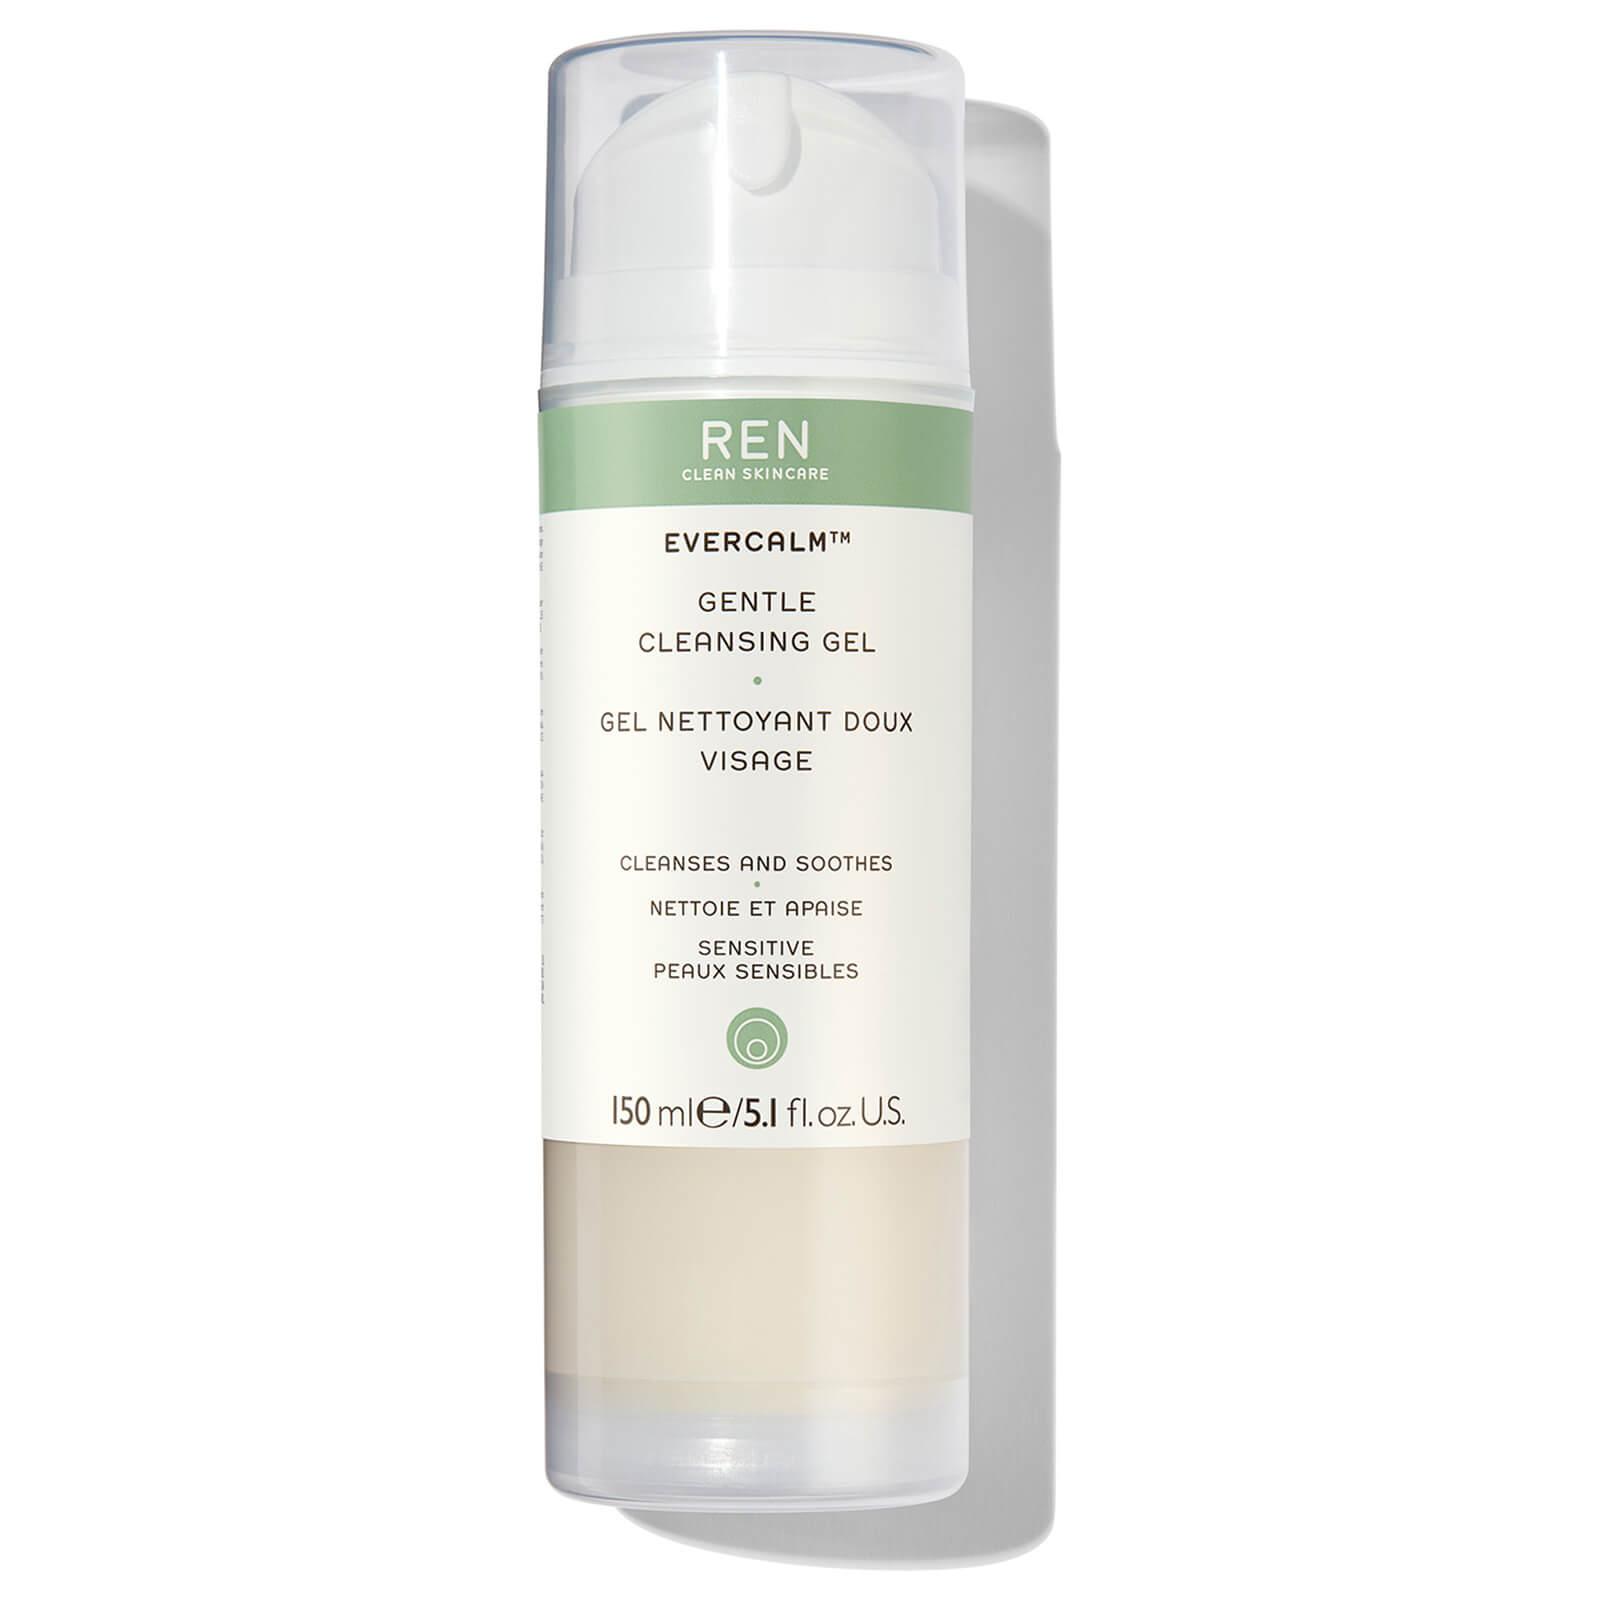 Ren Clean Skincare Evercalm™ Gentle Cleansing Gel 5.1 oz/ 150 ml